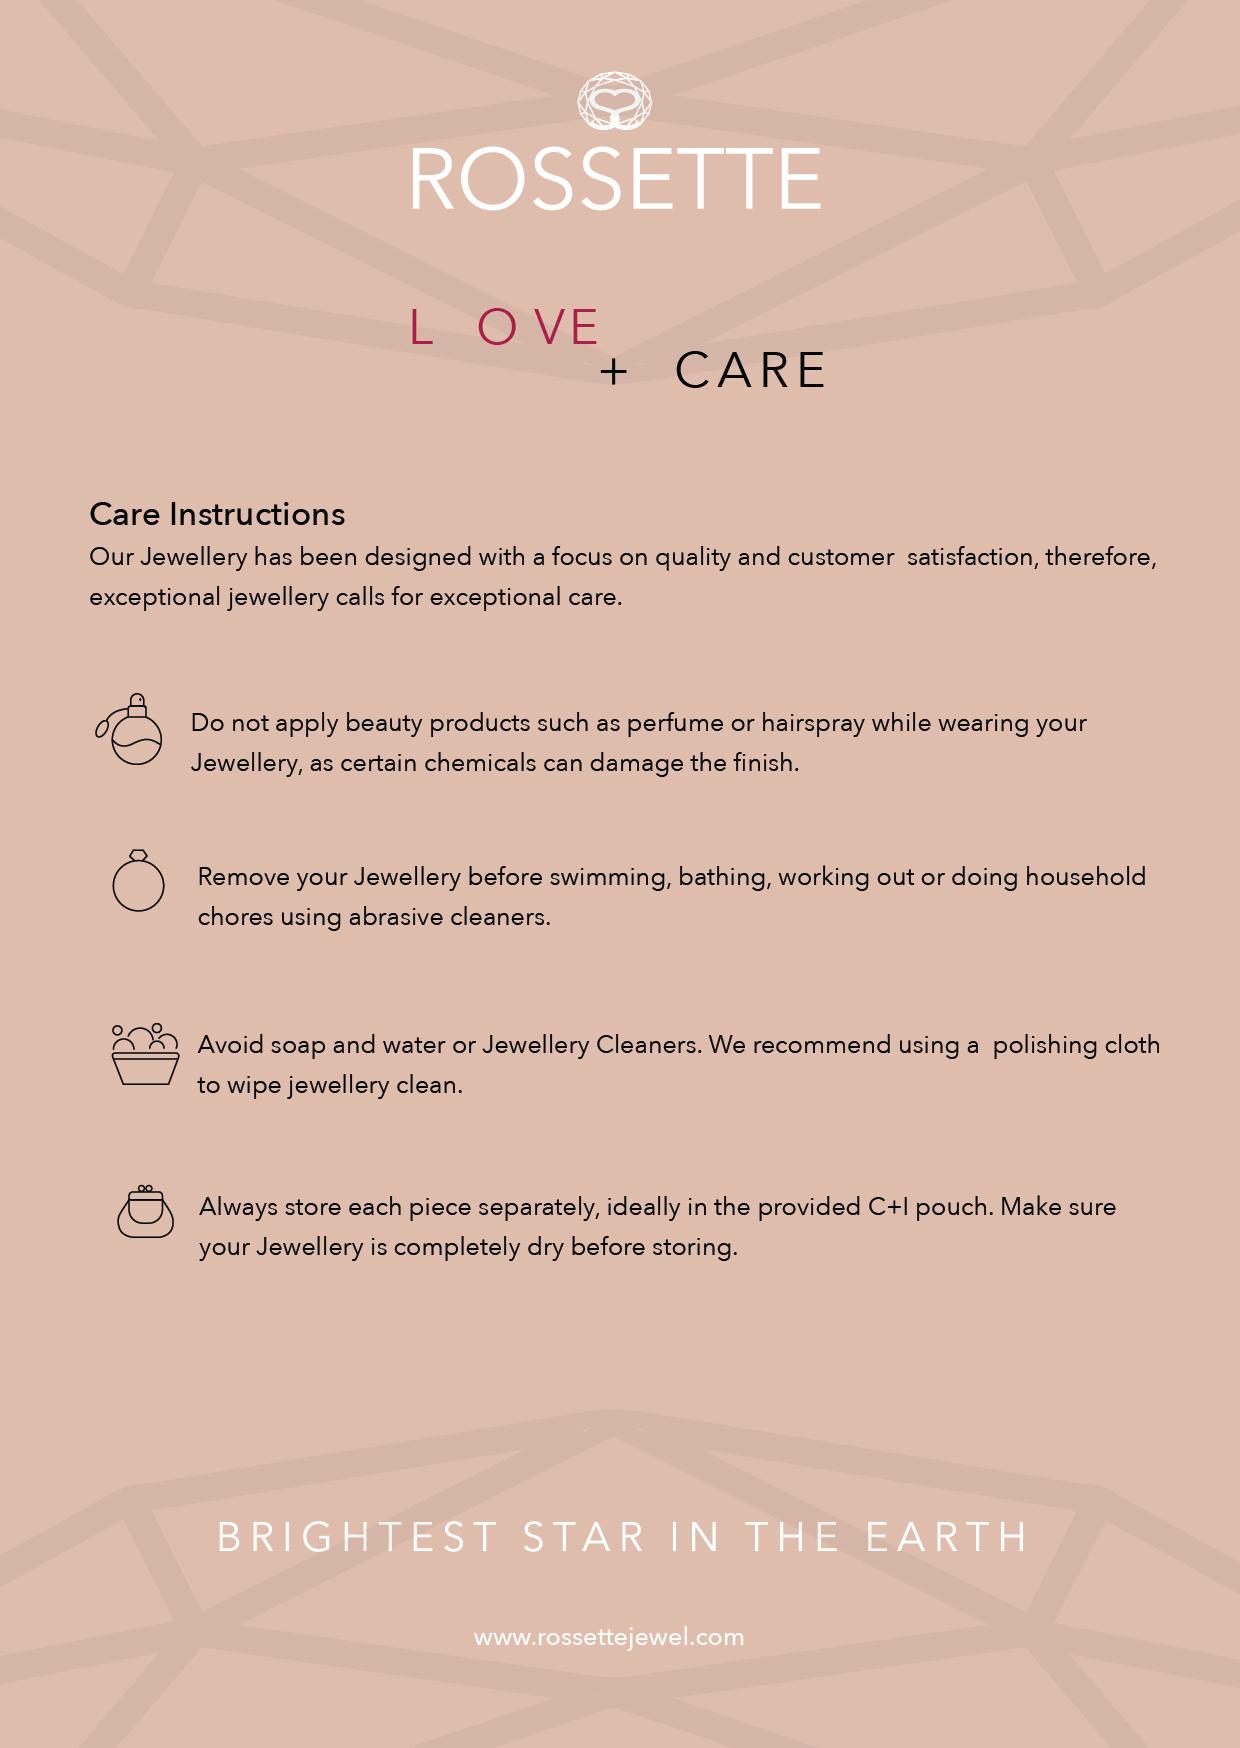 productcare-02